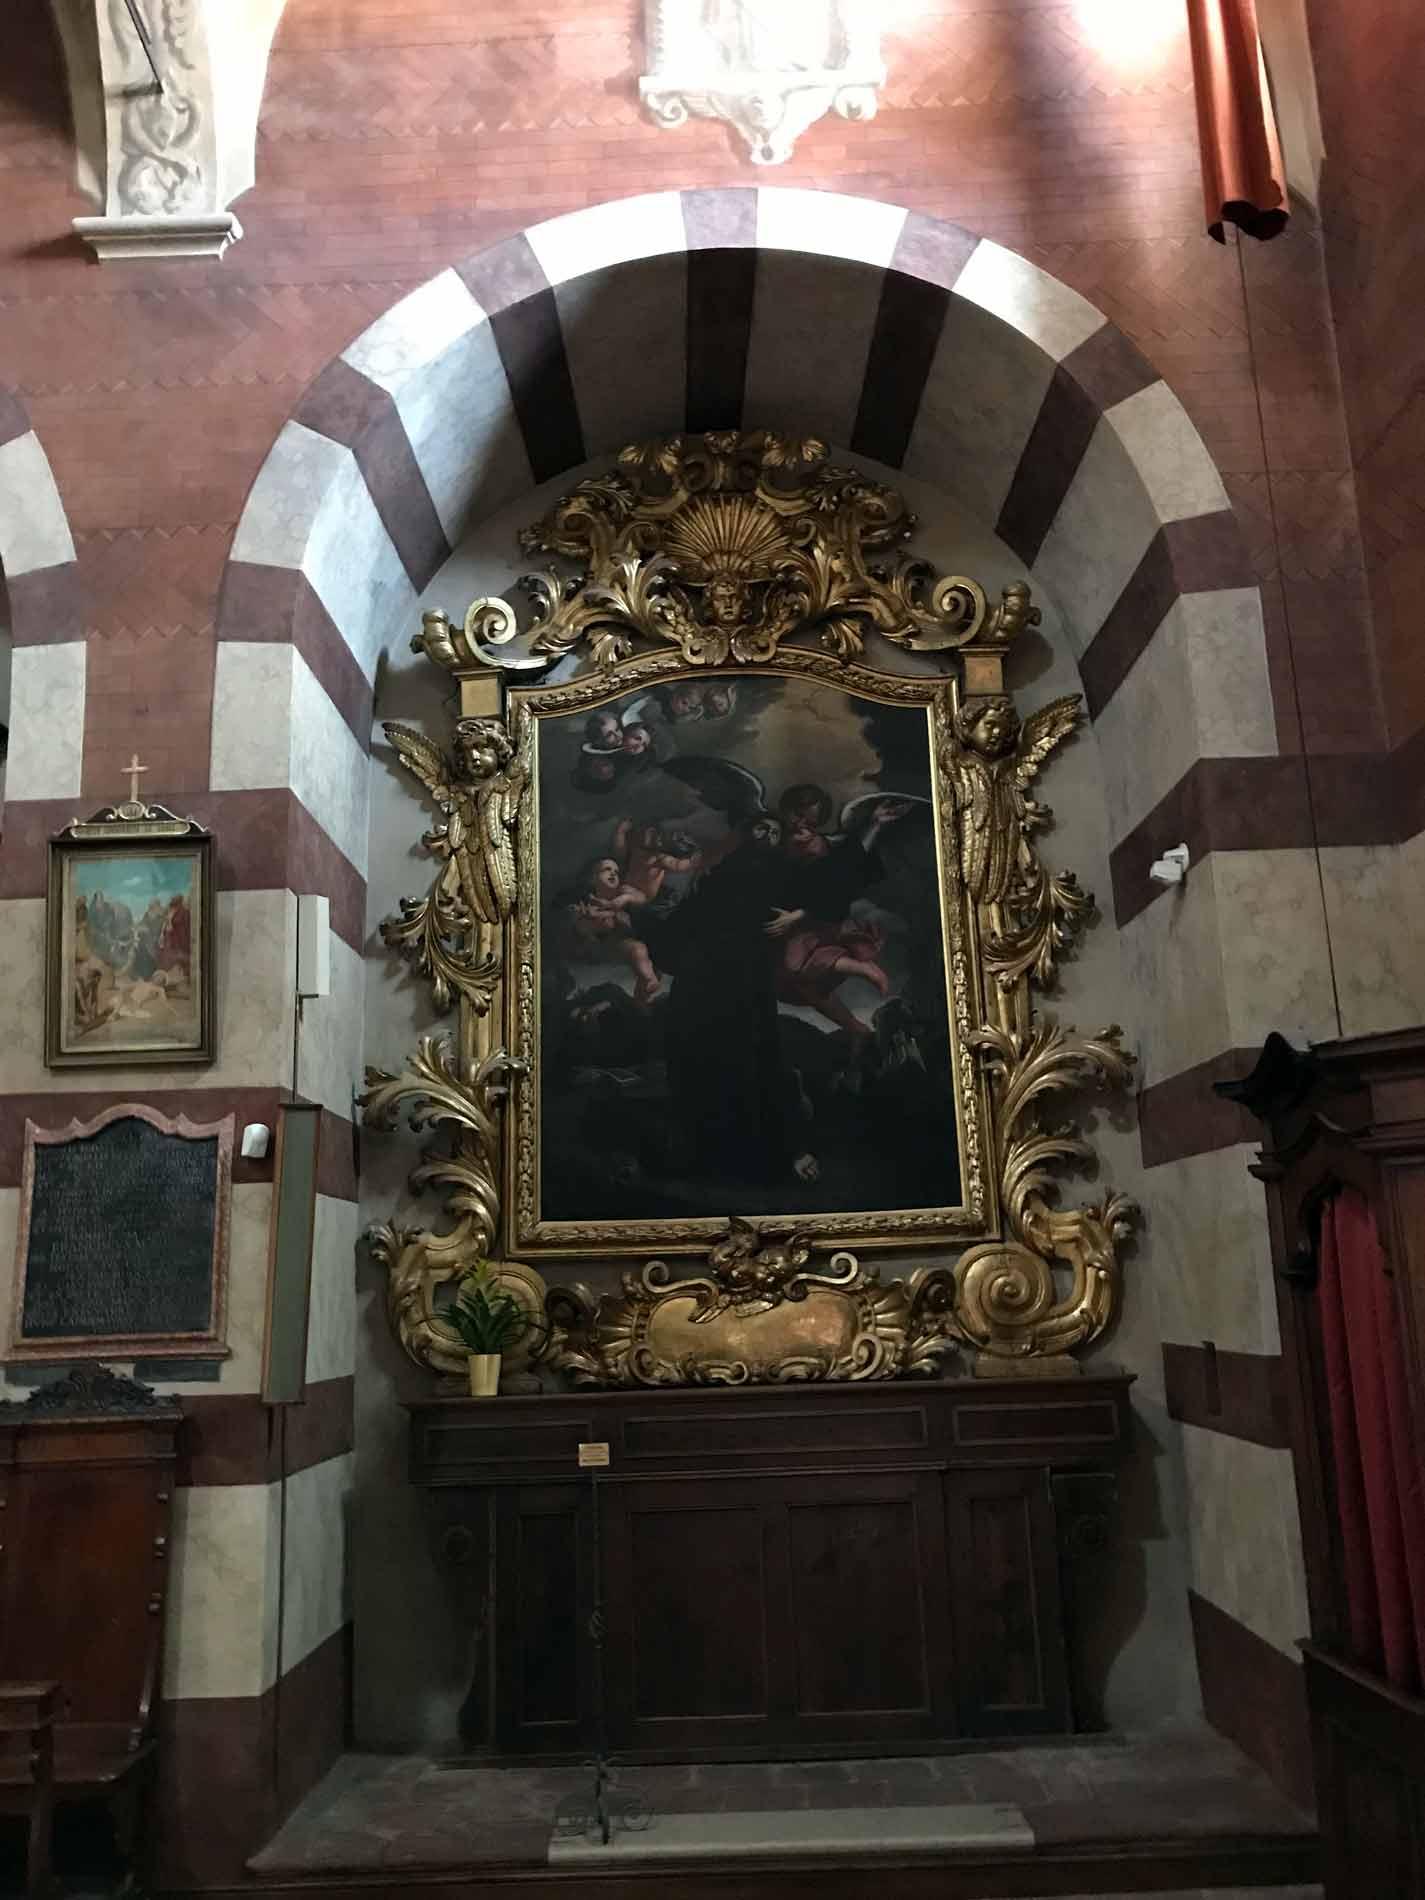 Chiesa-San-michele-cremona-dipinto-medievale-rinascimentale